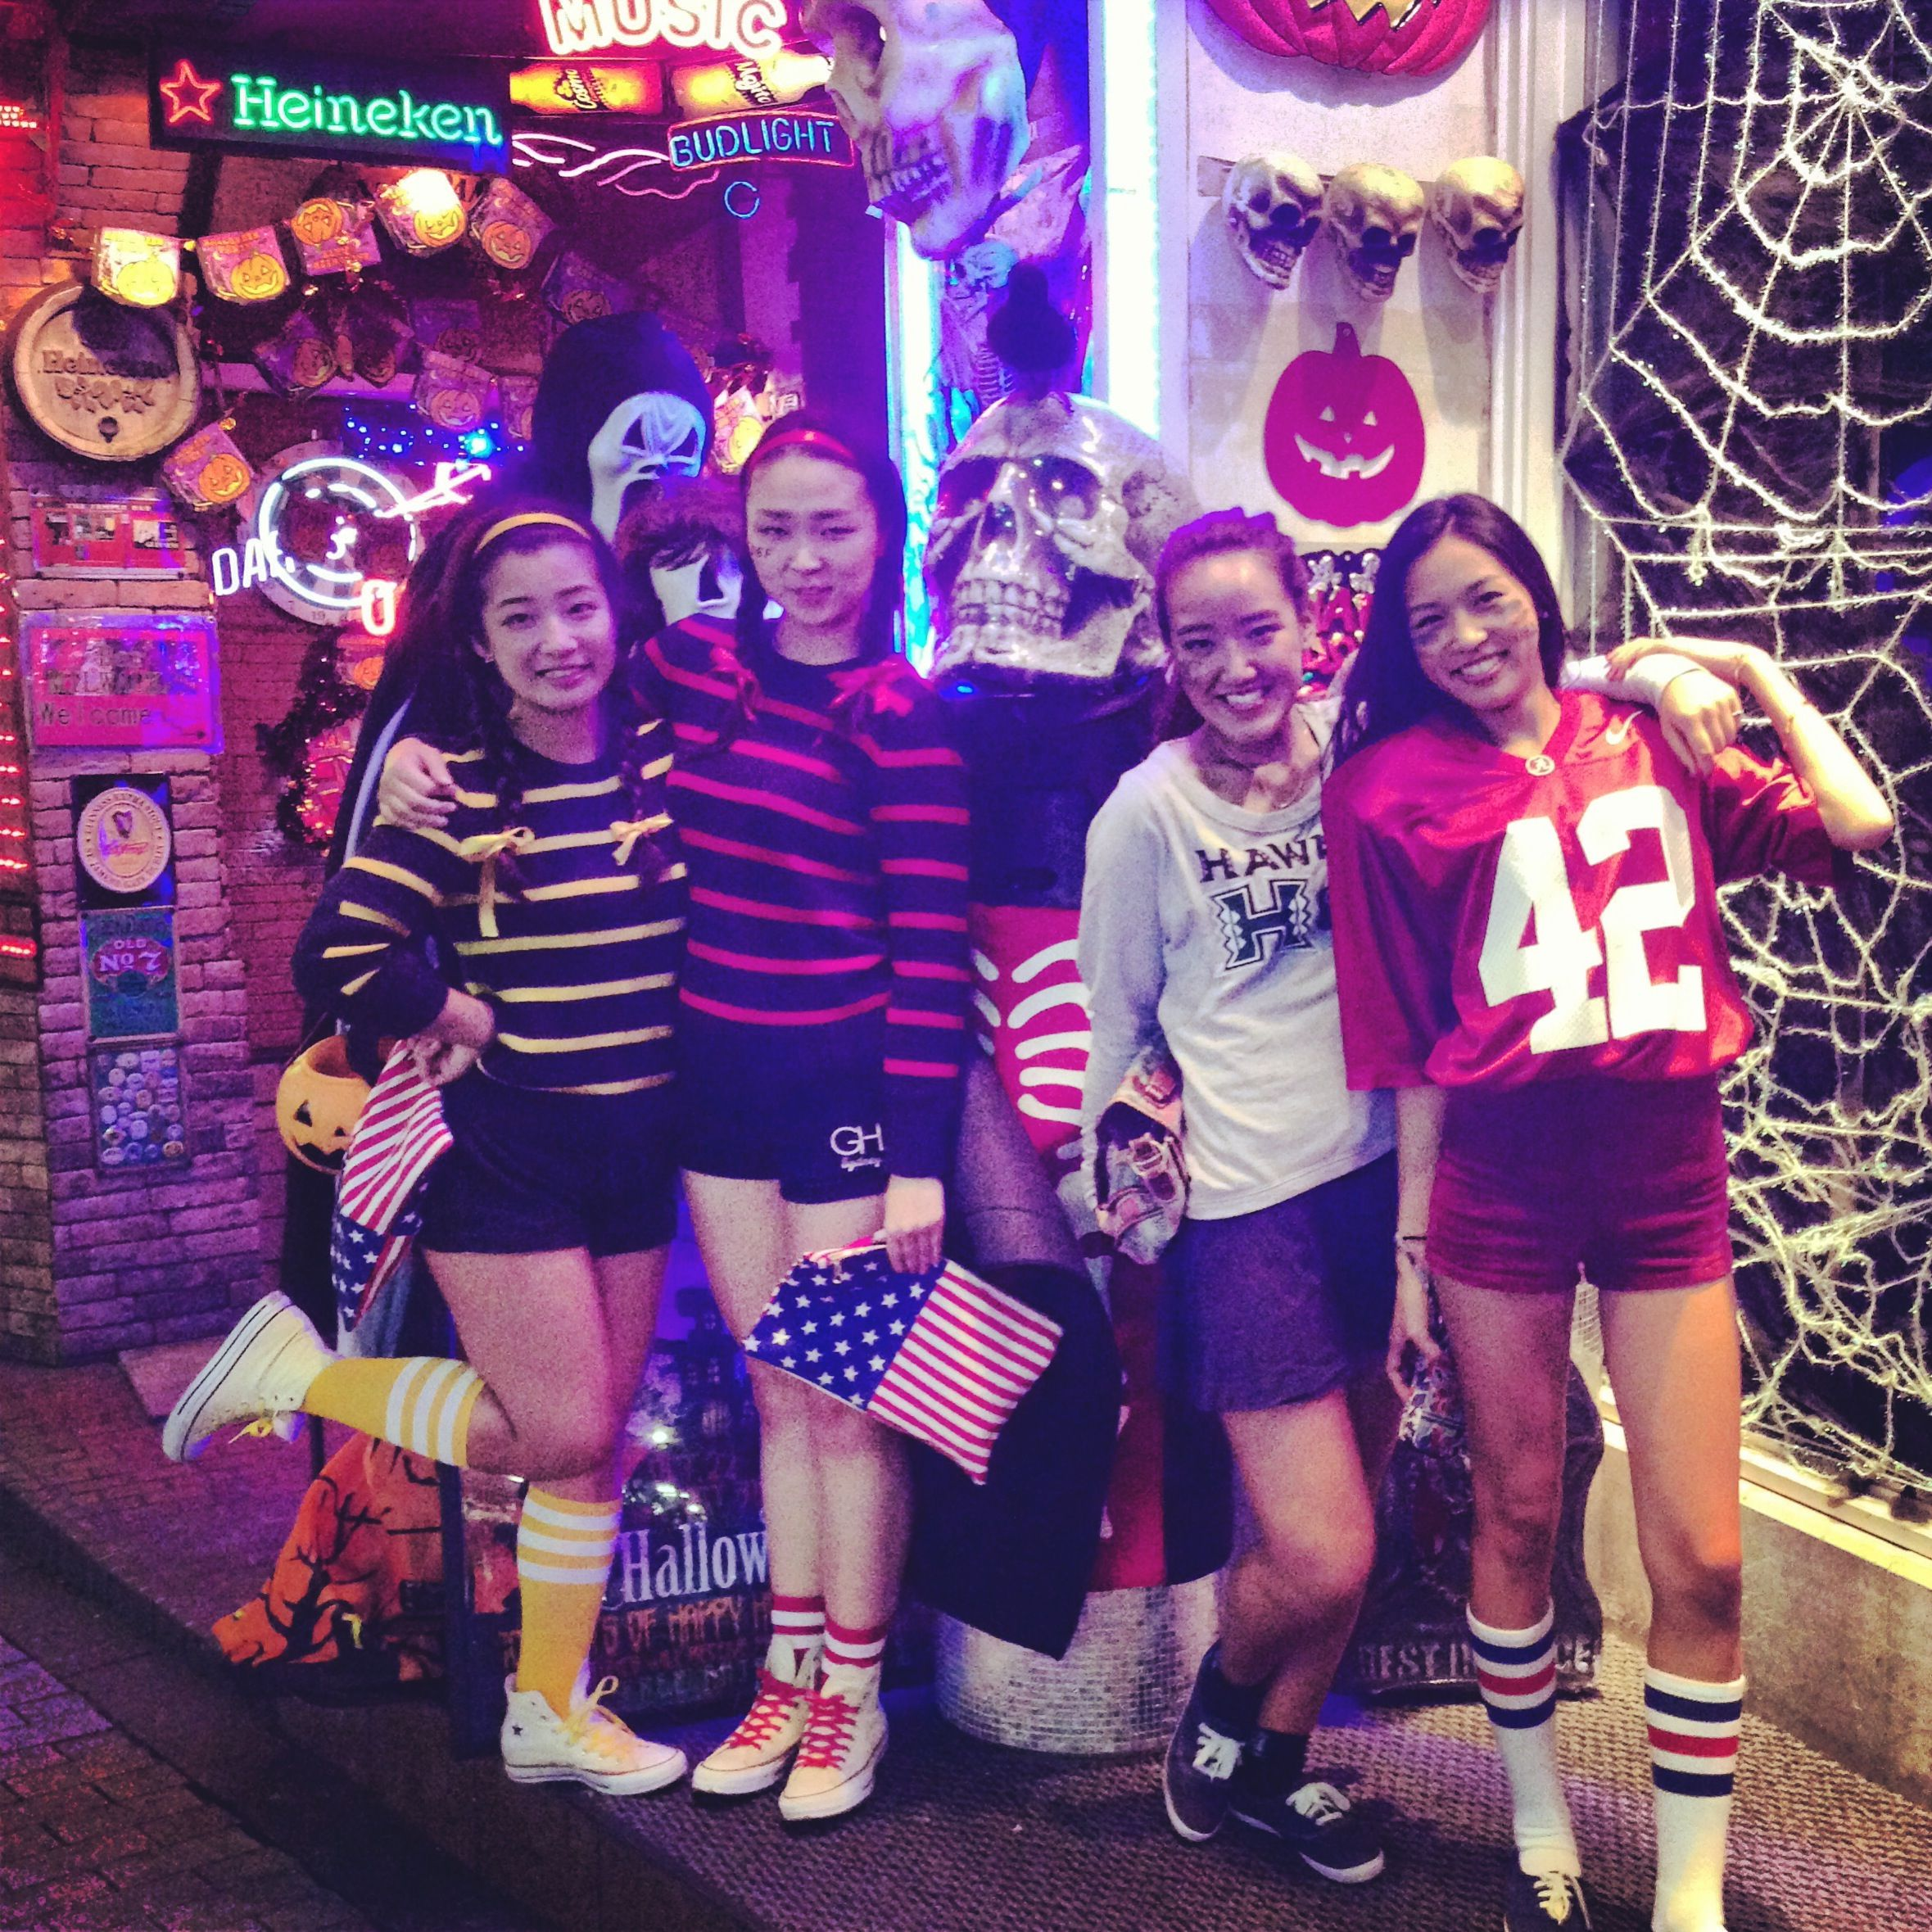 halloweencostumeamericancollegefootball - Girls Football Halloween Costume